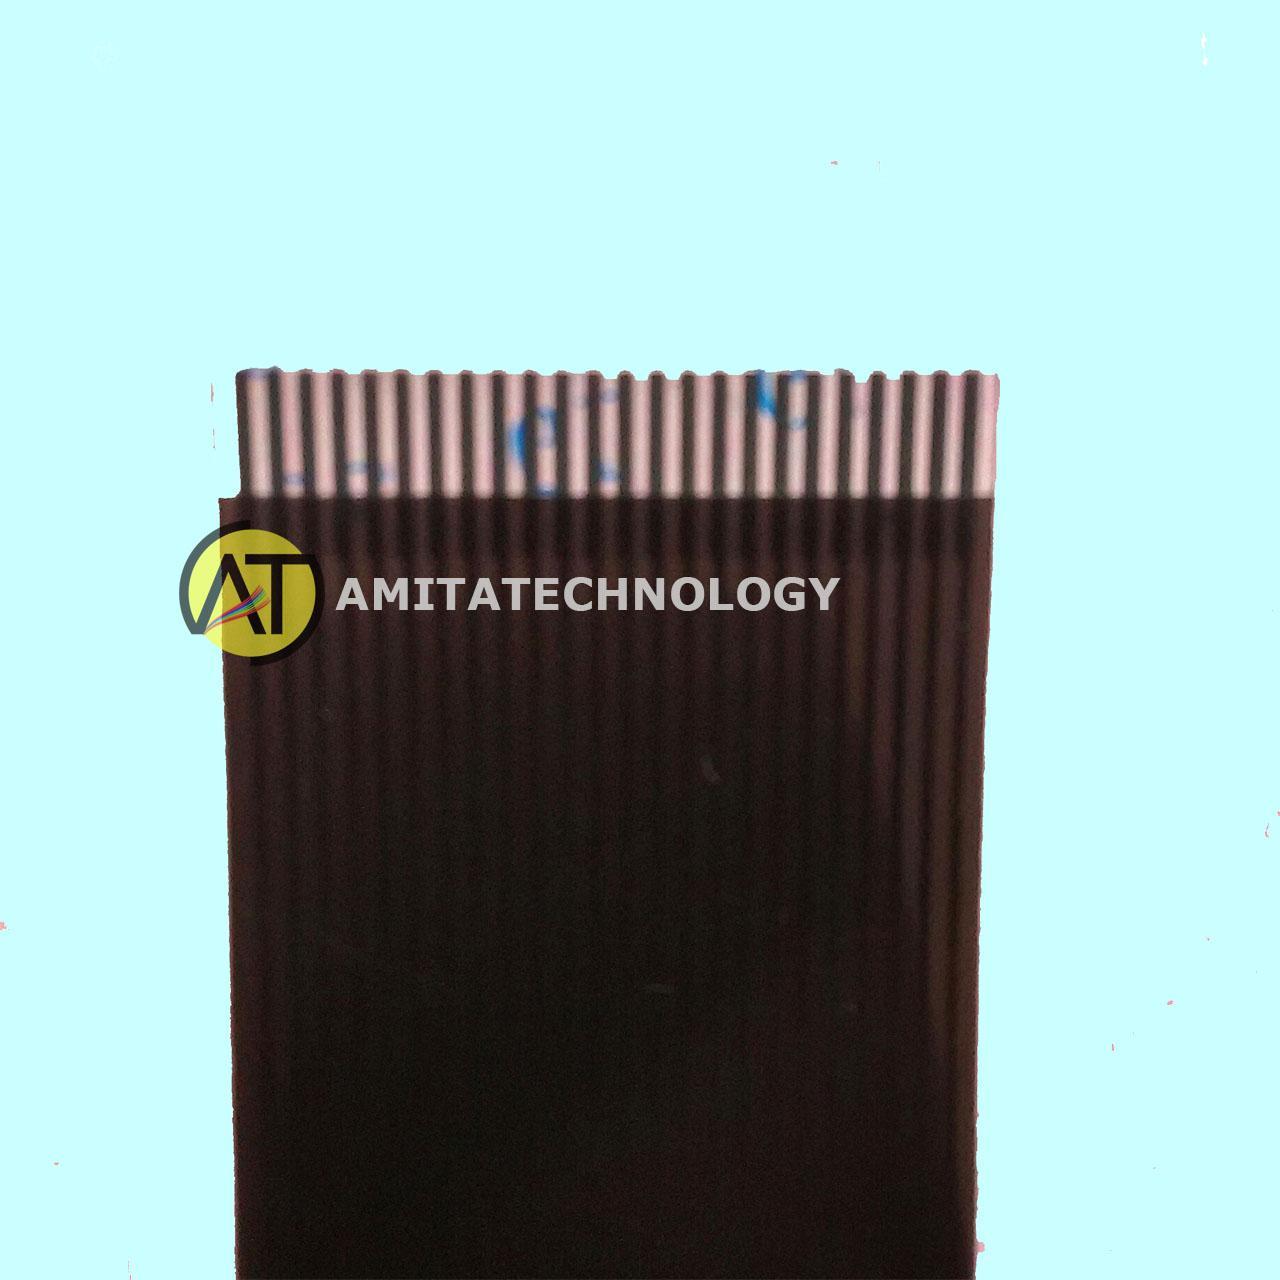 Axioo Keyboard Neon Mnc M54 Series Hitam Daftar Harga Terbaru Dan Pico Cjm W217cu Pjm M1110 Frame Amita Laptop Original M54n M540 M540n M54v 2